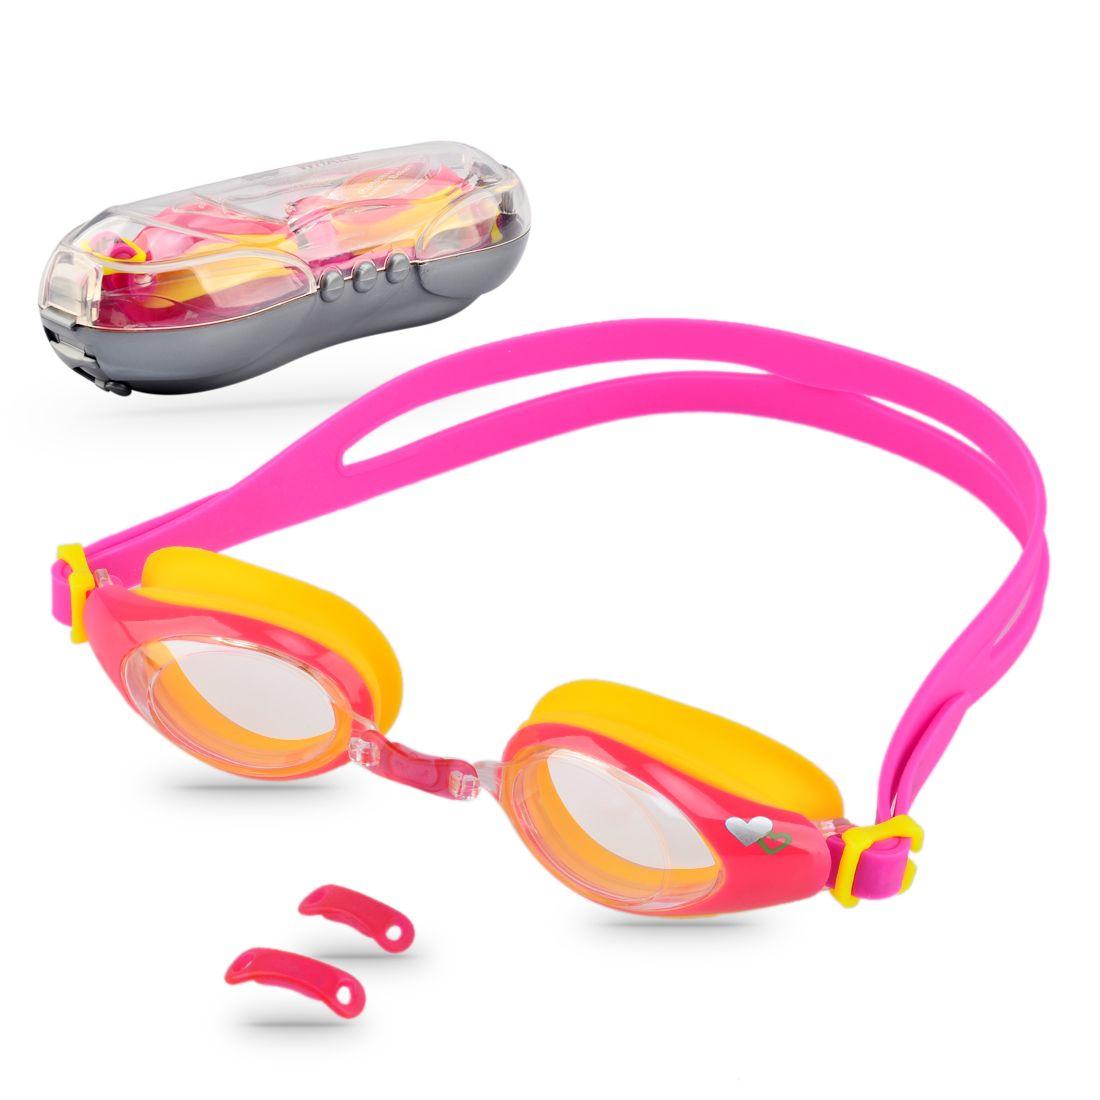 641dea9e4604 2019 UV Protection Kids Swim Goggles Anti Fog Lens Soft Silicone Frame Child  Swimming Goggles For Children From Jersey168